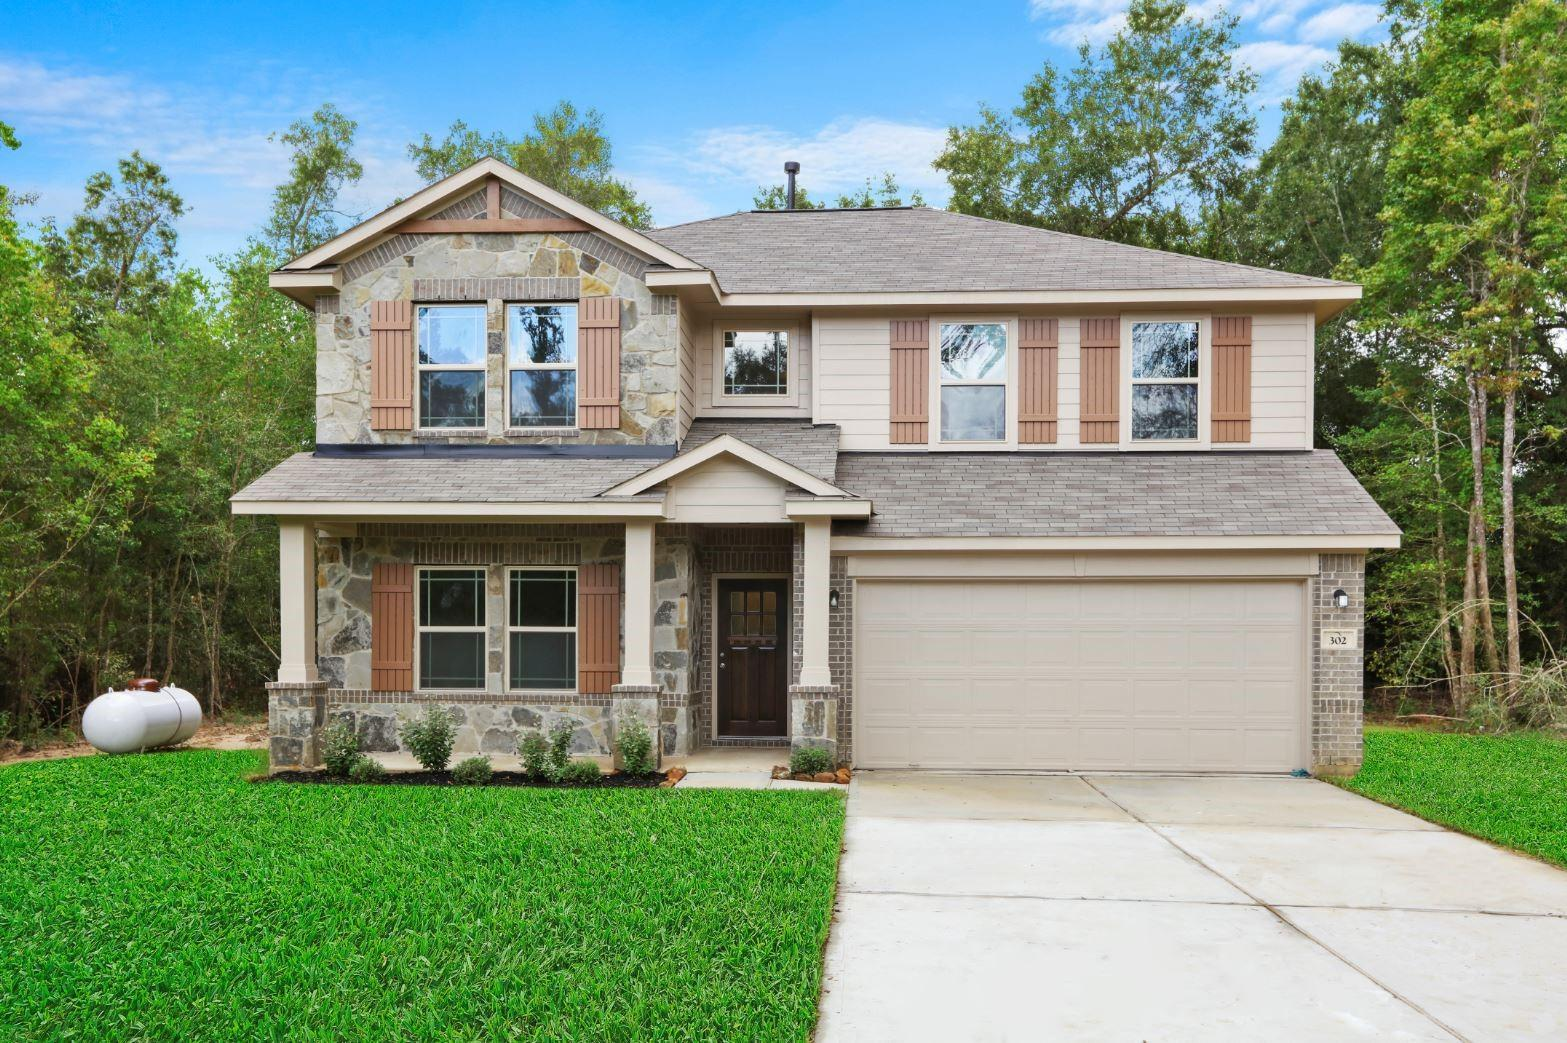 1115 Bernard Meadows Property Photo - East Bernard, TX real estate listing